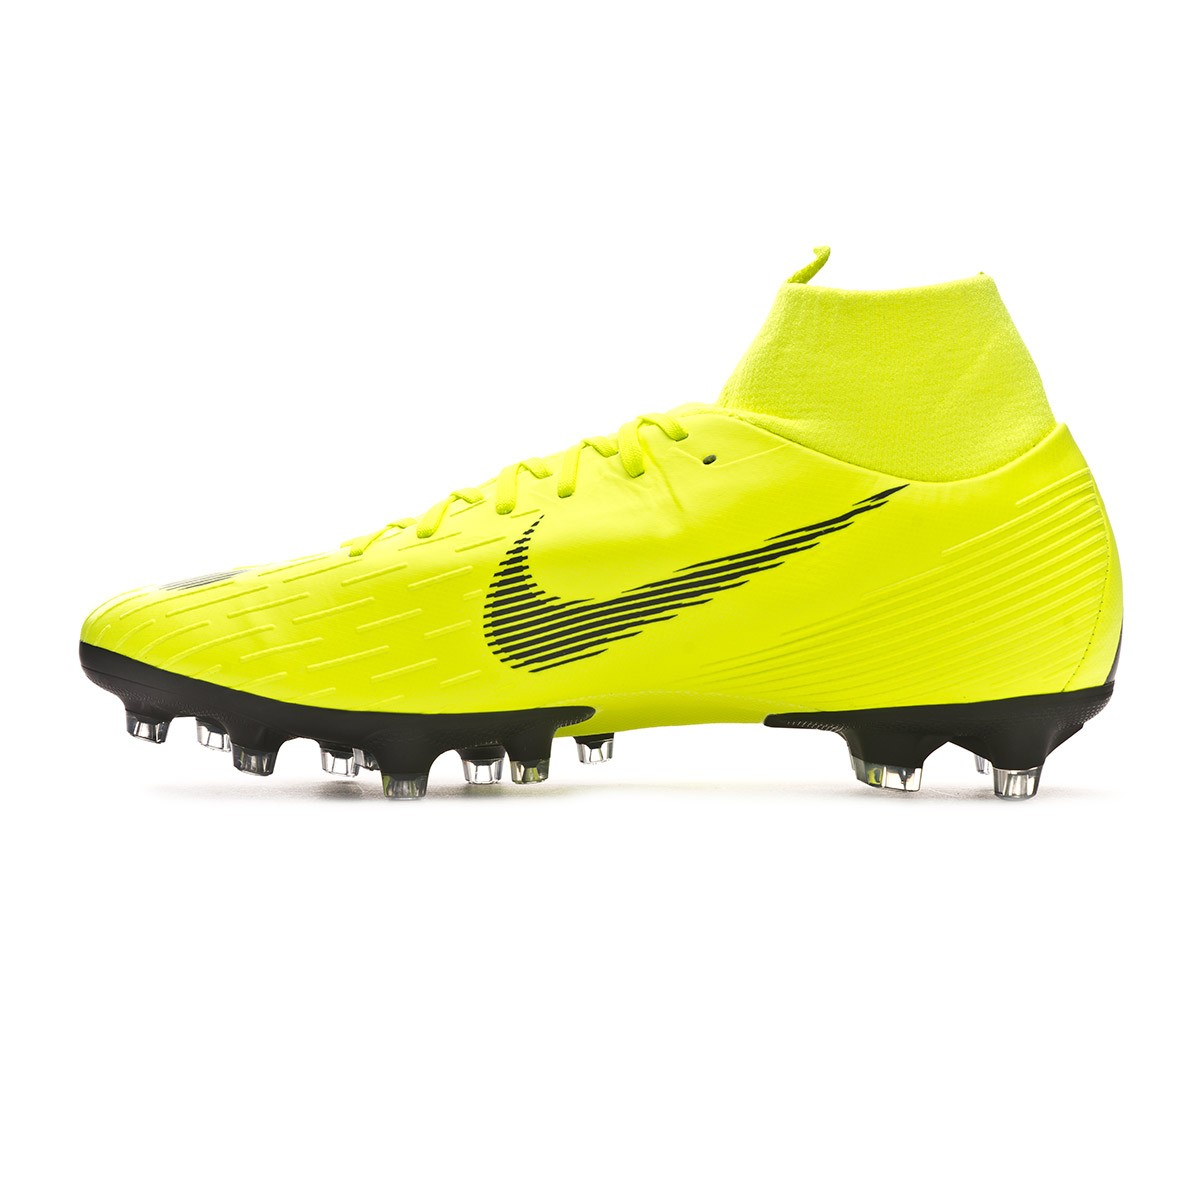 010be5456e02 Football Boots Nike Mercurial Superfly VI Pro AG-Pro Volt-Black - Tienda de  fútbol Fútbol Emotion